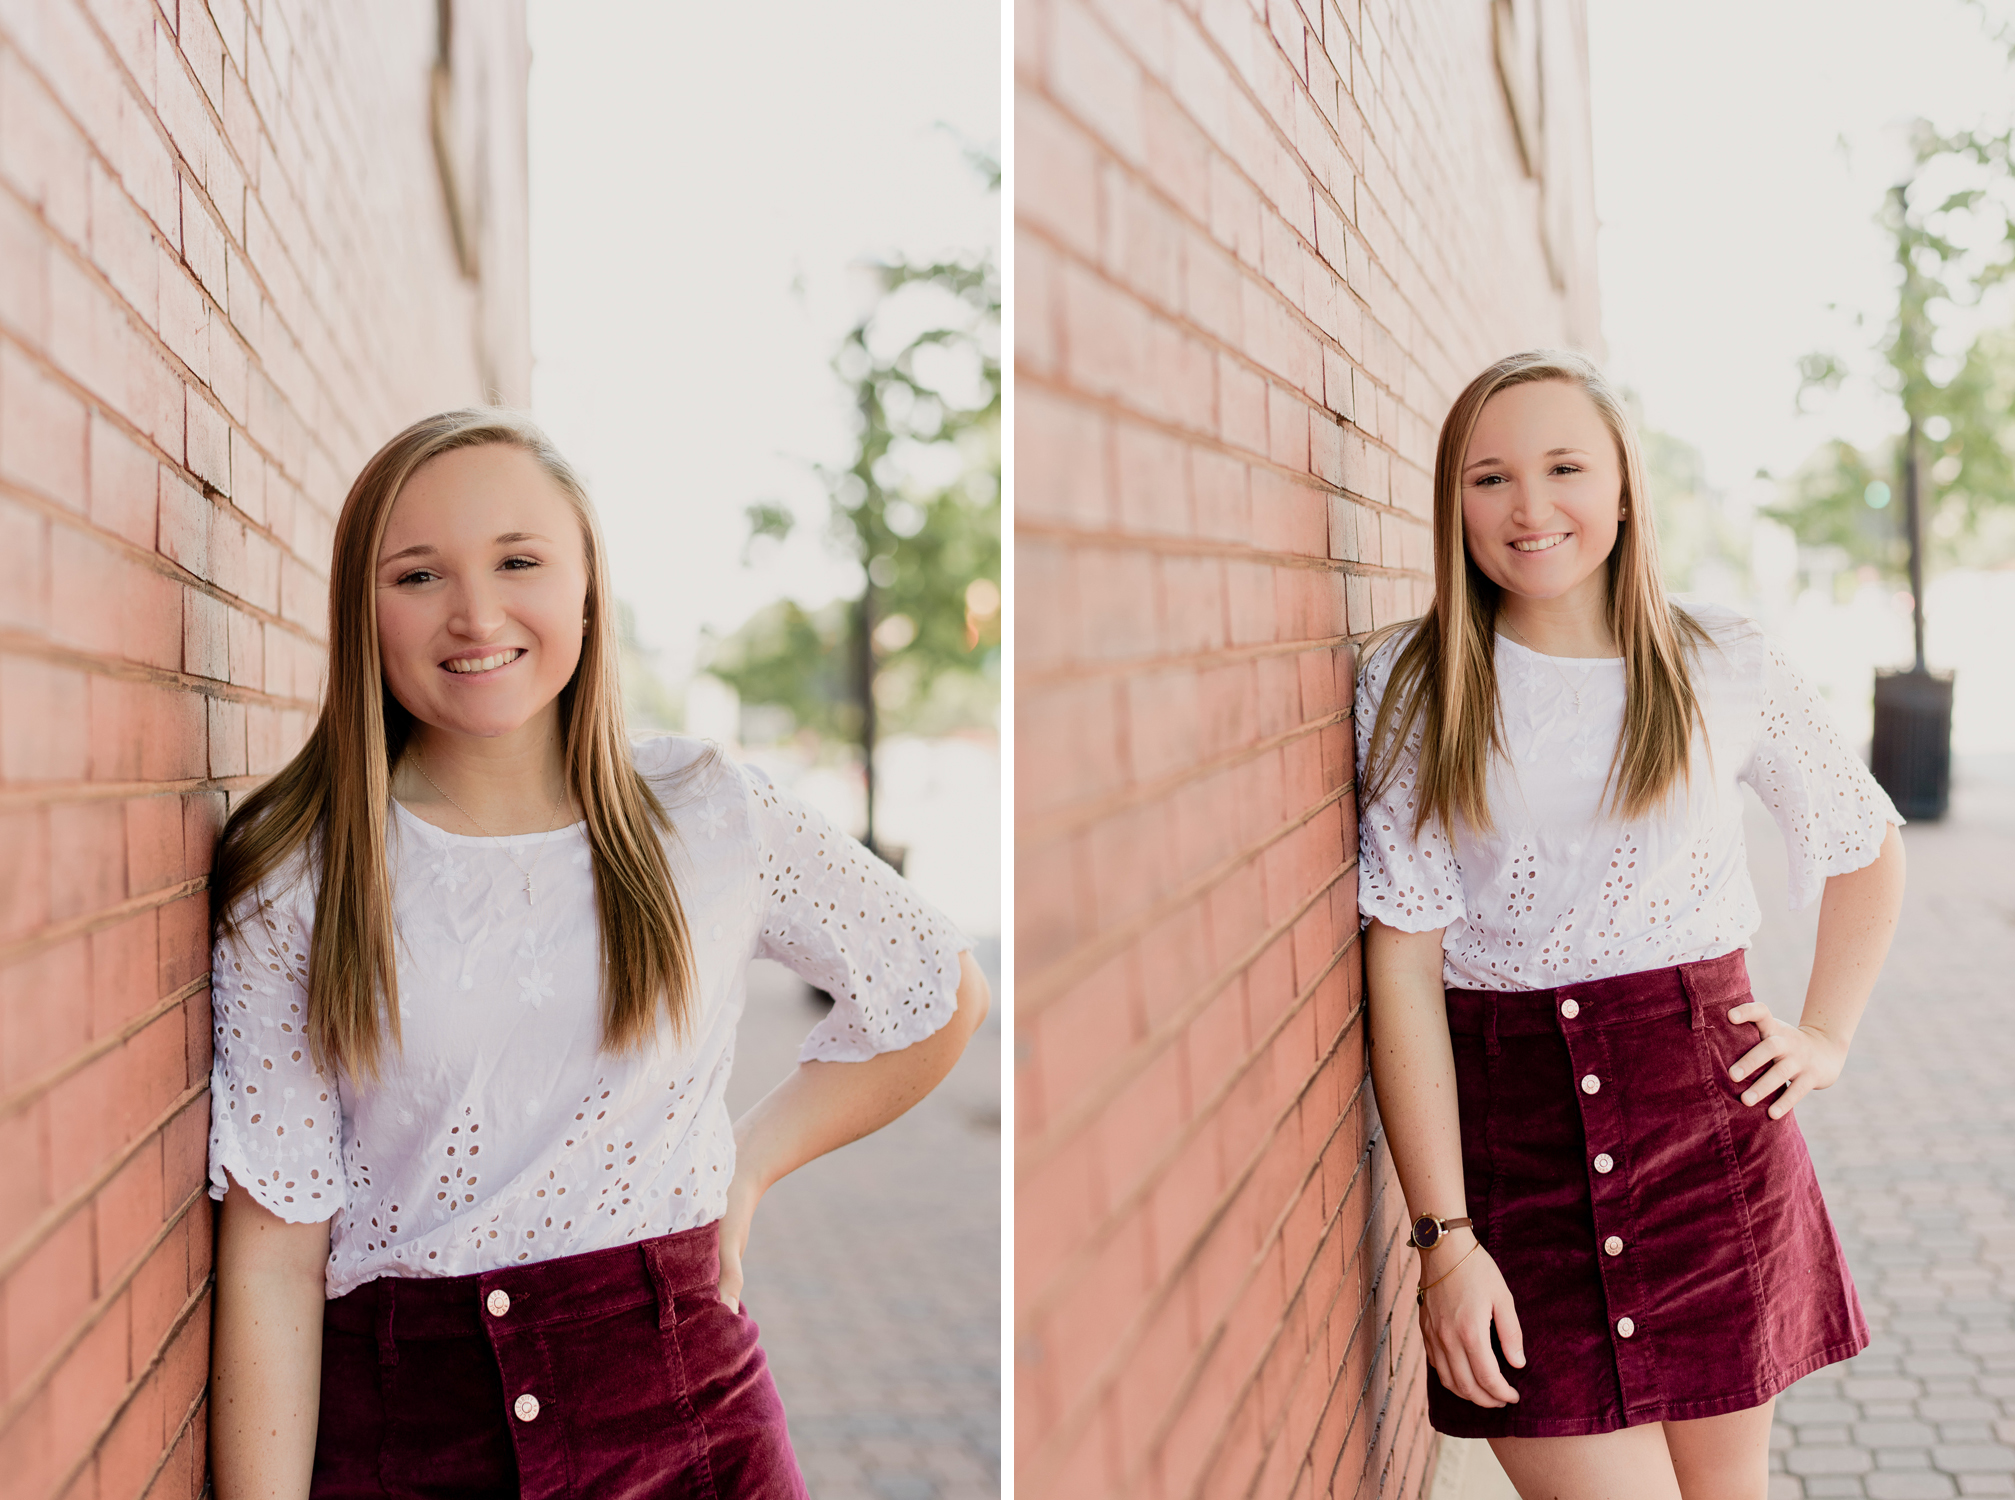 holland-michigan-high-school-senior-portrait-photographer (28).jpg